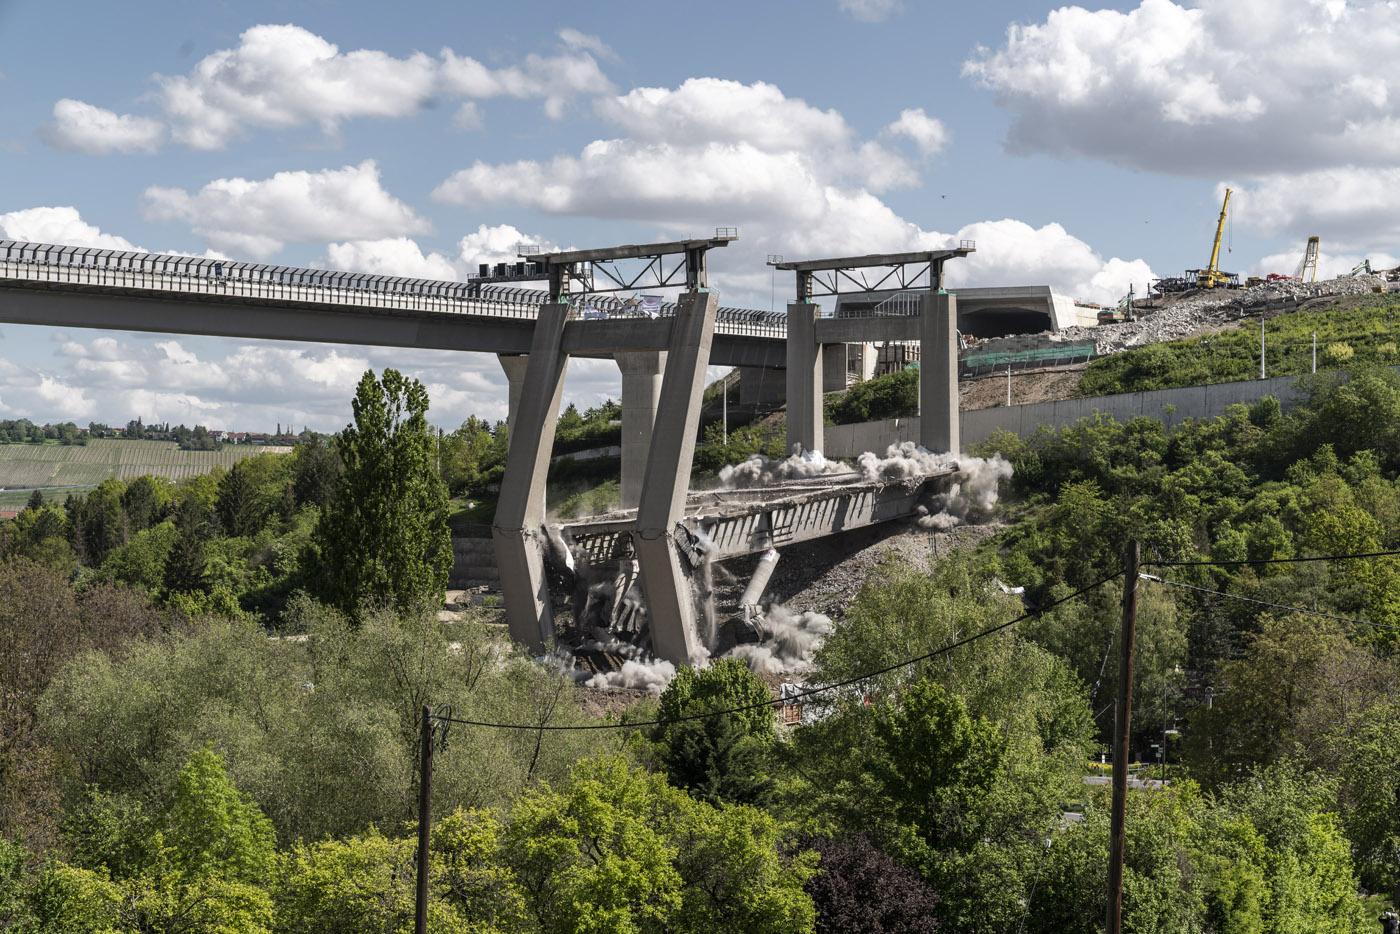 Sprengung Talbrücke Heidingsfeld Autobahn A3 Würzburg Frankfurt